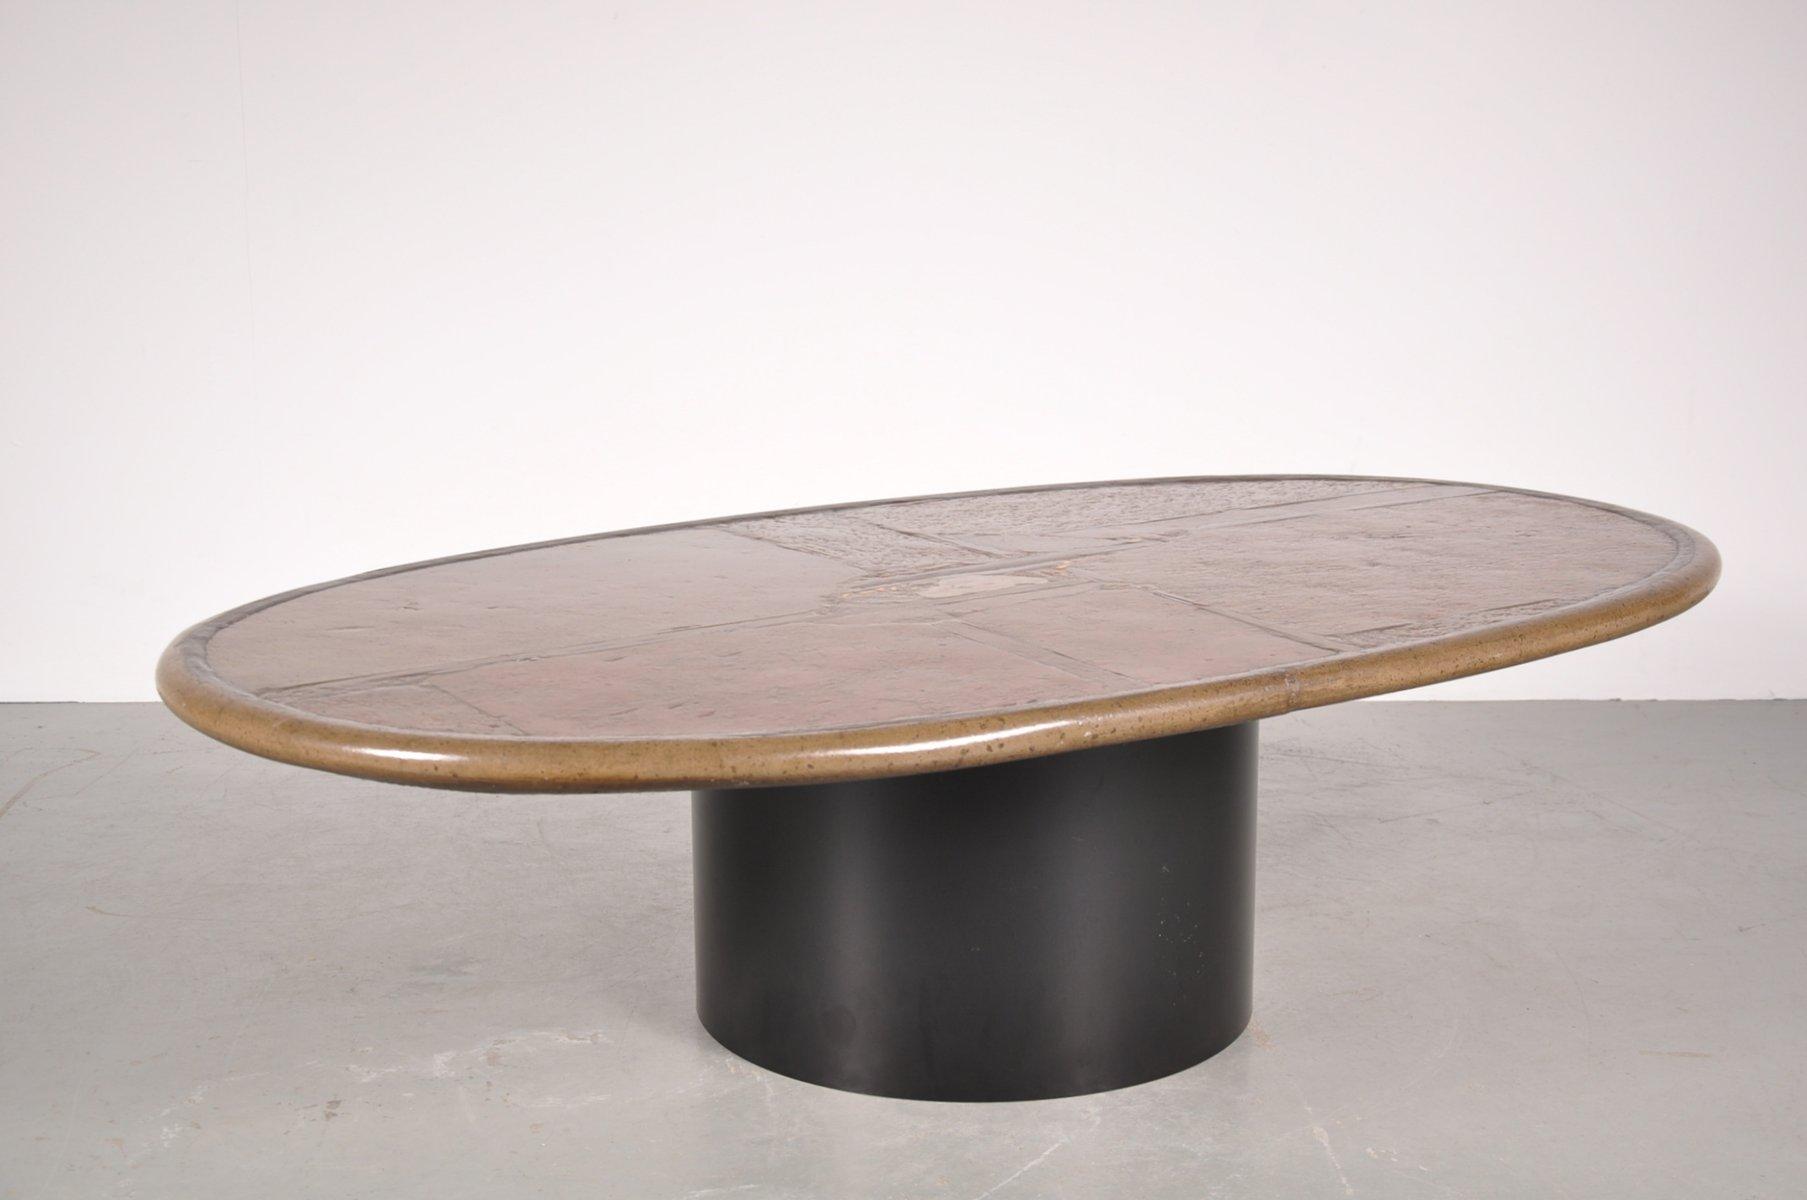 vintage stone coffee table by paul kingma  for sale at pamono - vintage stone coffee table by paul kingma